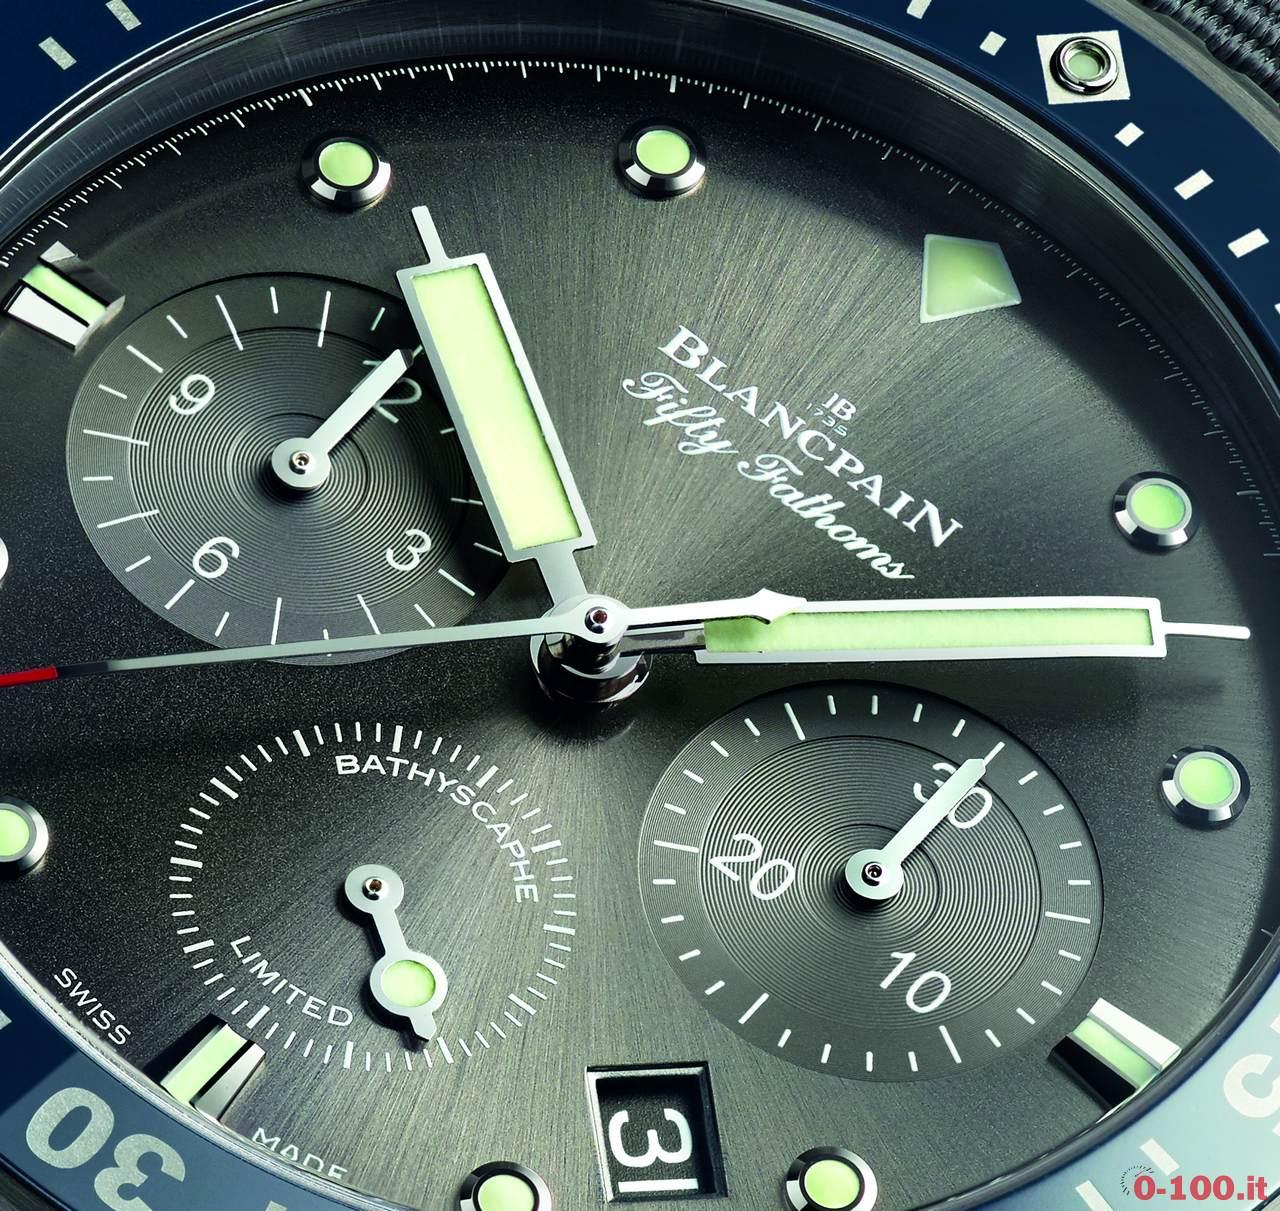 blancpain-bathyscaphe-chronographe-flyback-blancpain-ocean-commitment-ii-prezzo-price_0-1004